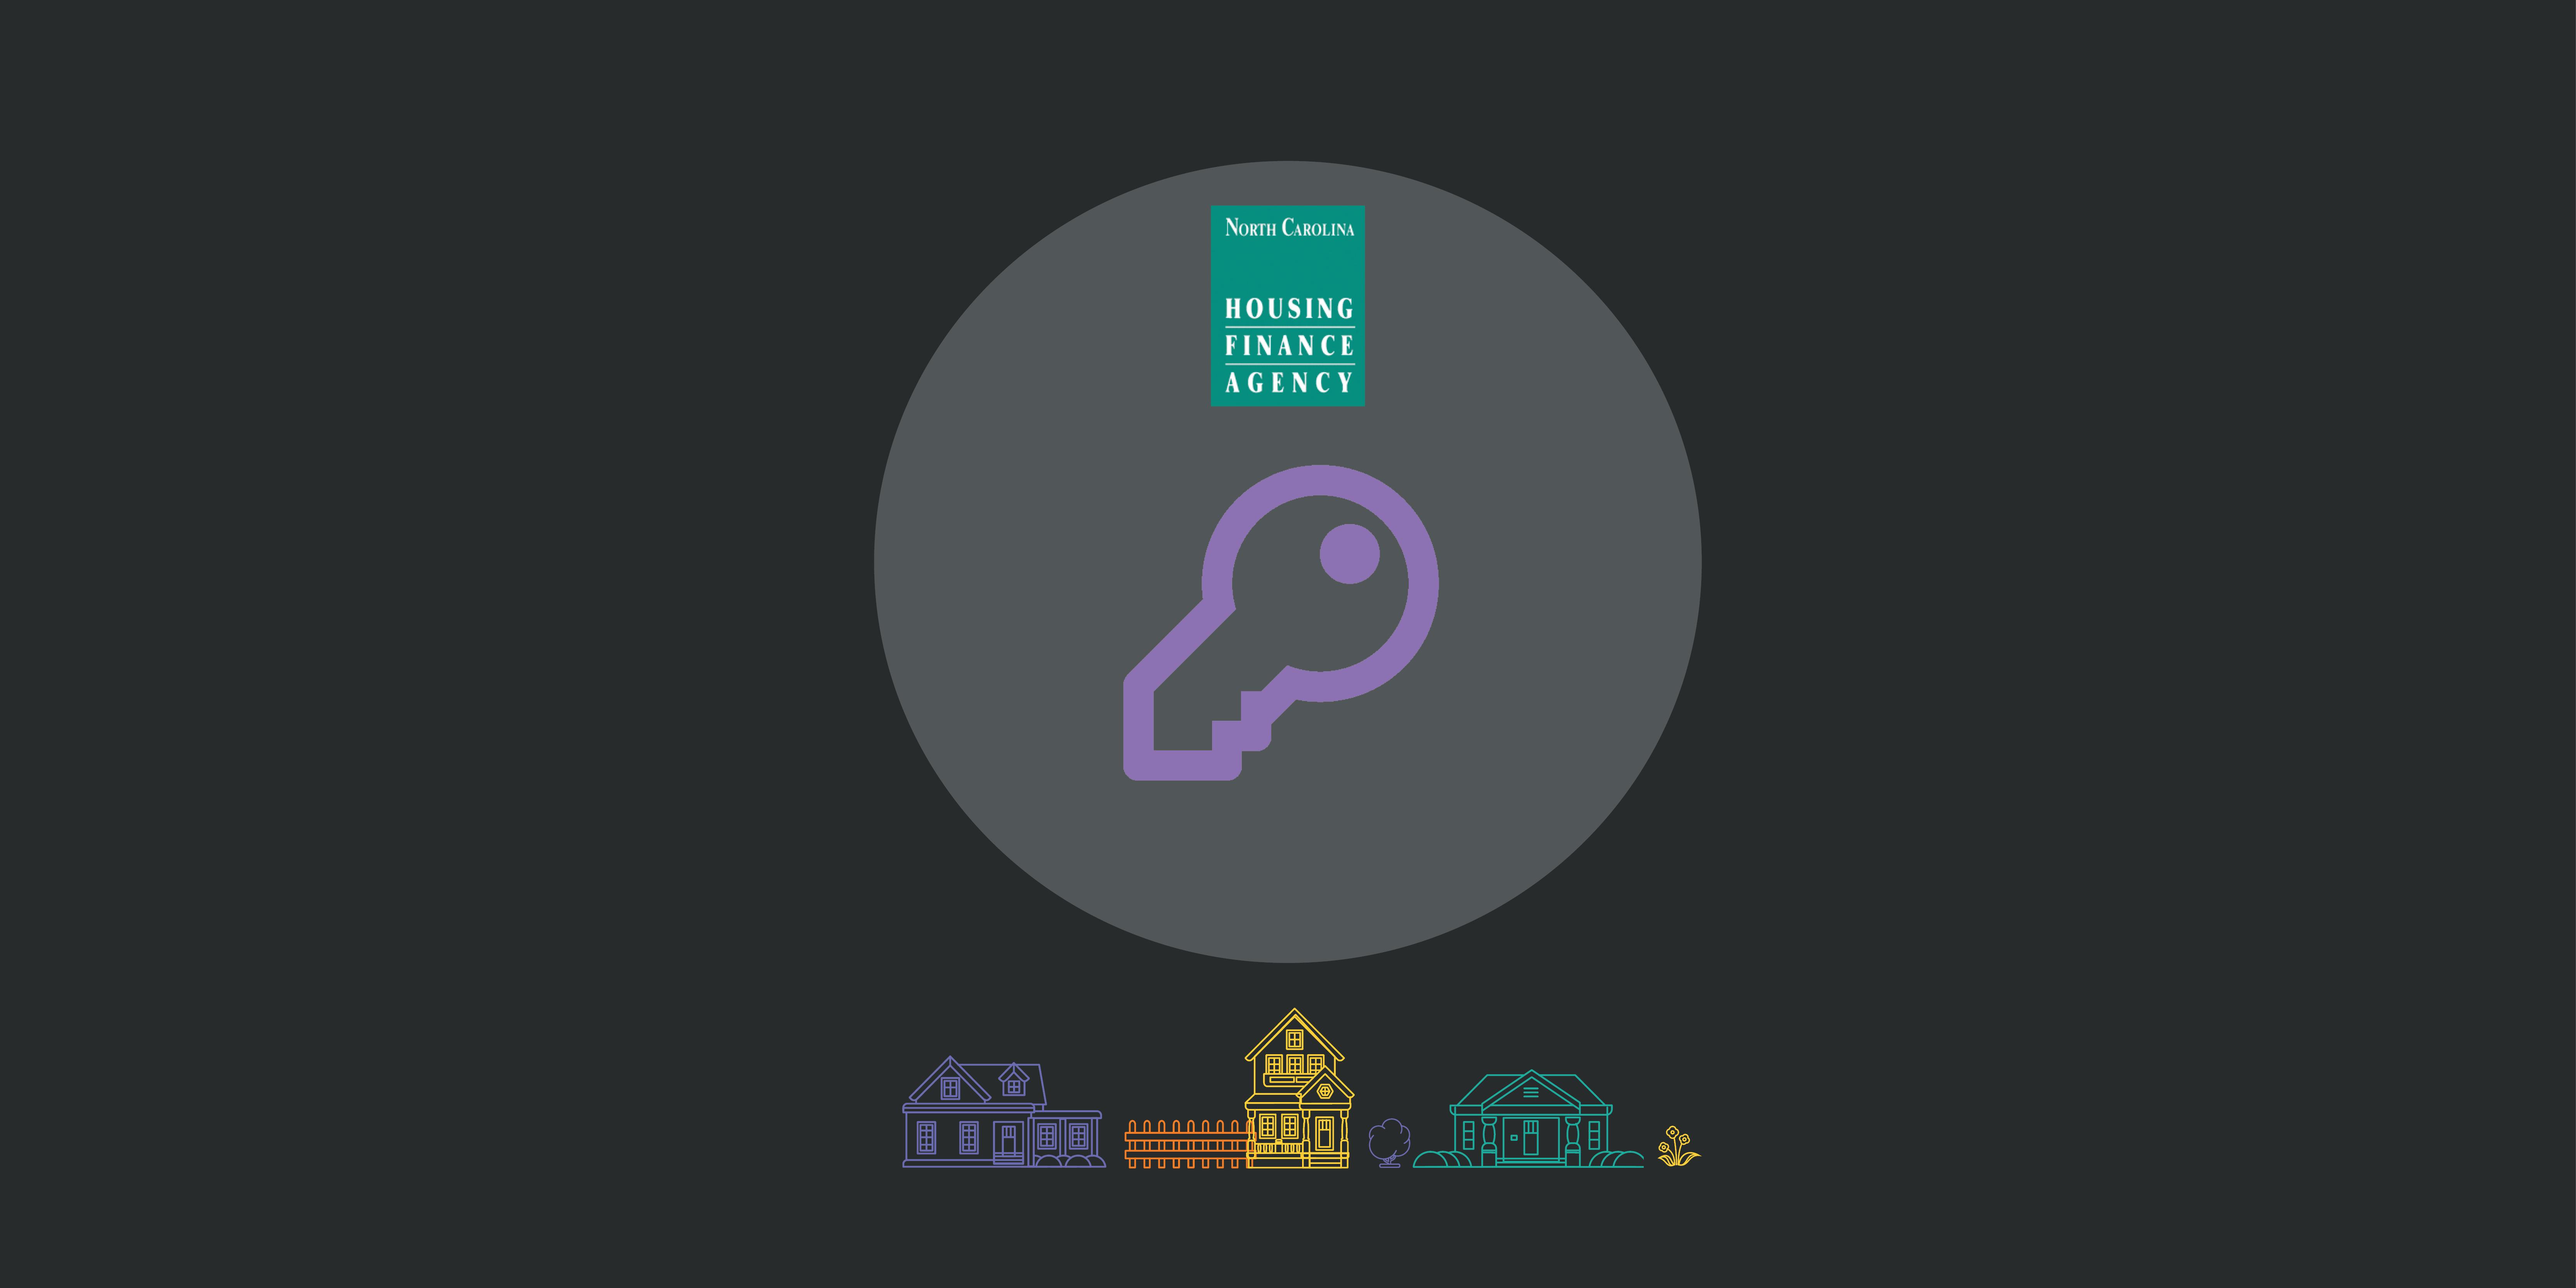 Purple key icon